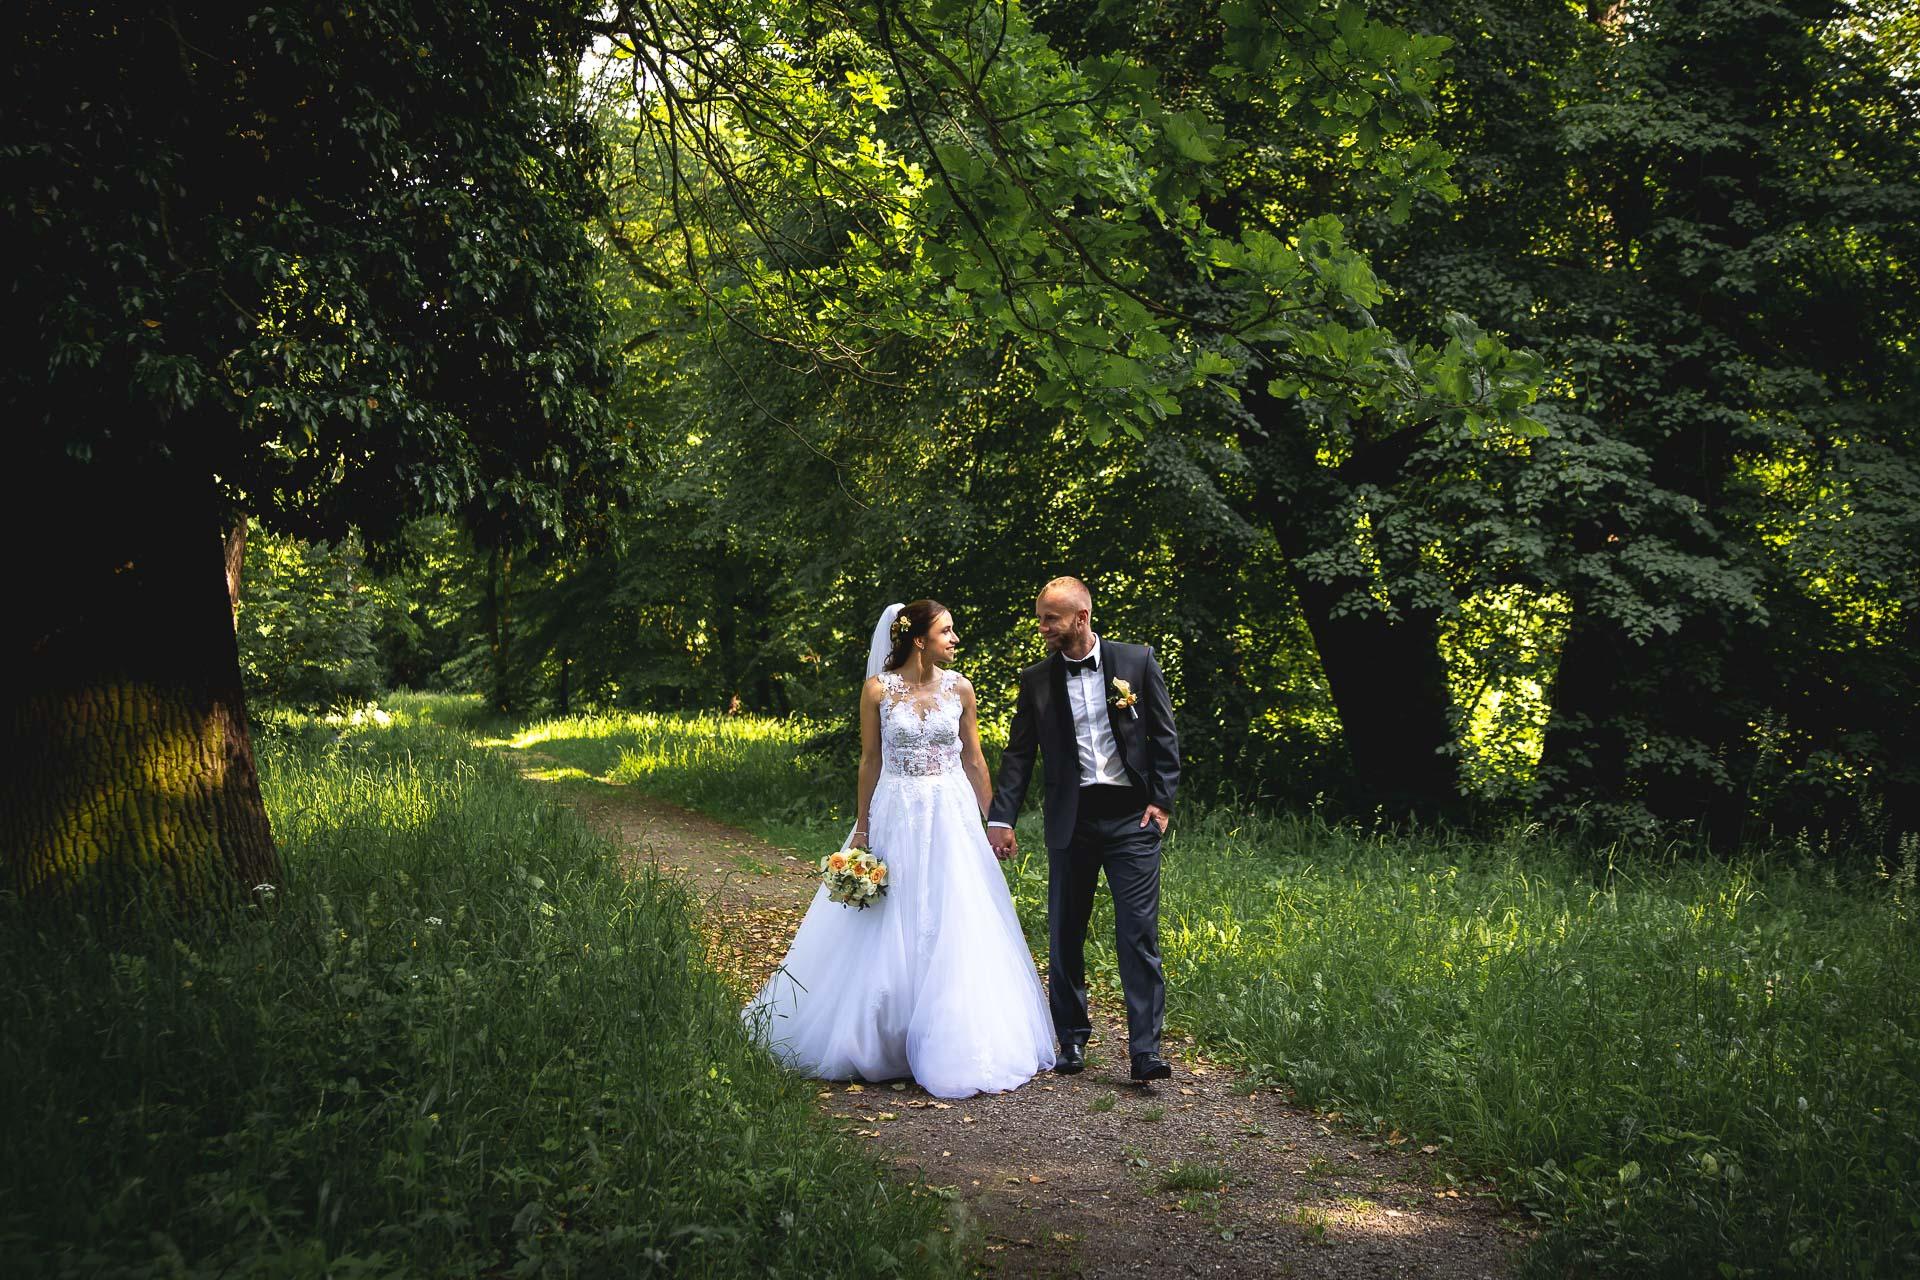 svatební-fotograf-svatebni-video-Nymburk-hotel-Ostrov-Beautyfoto-6291